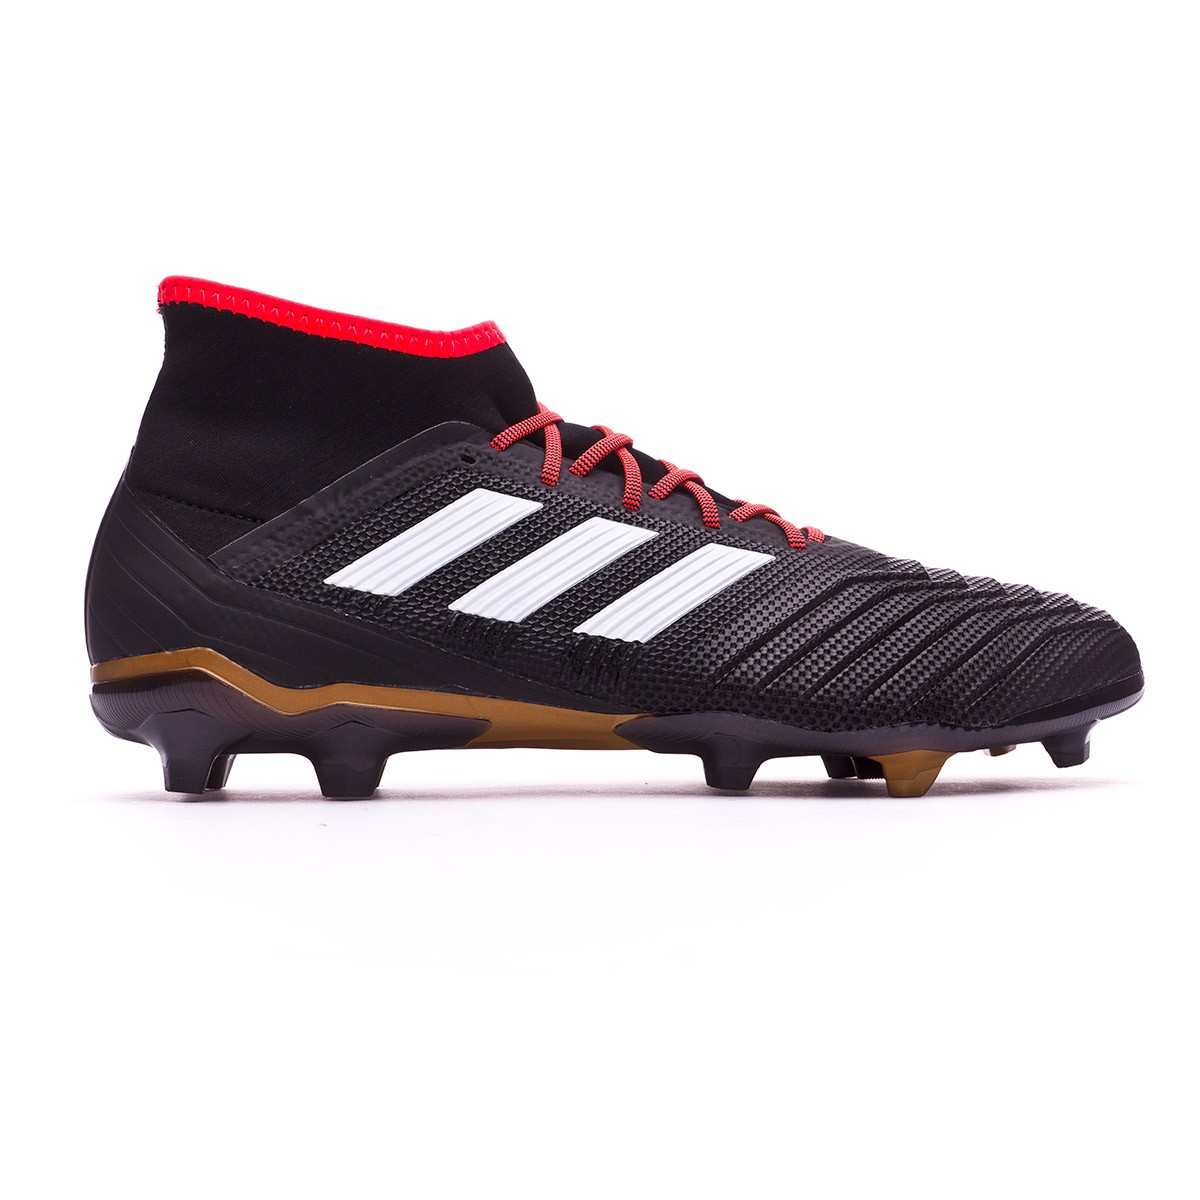 1dbe4fdee Football Boots adidas Predator 18.2 FG Core black-White-Gold metallic-Solar  red - Football store Fútbol Emotion